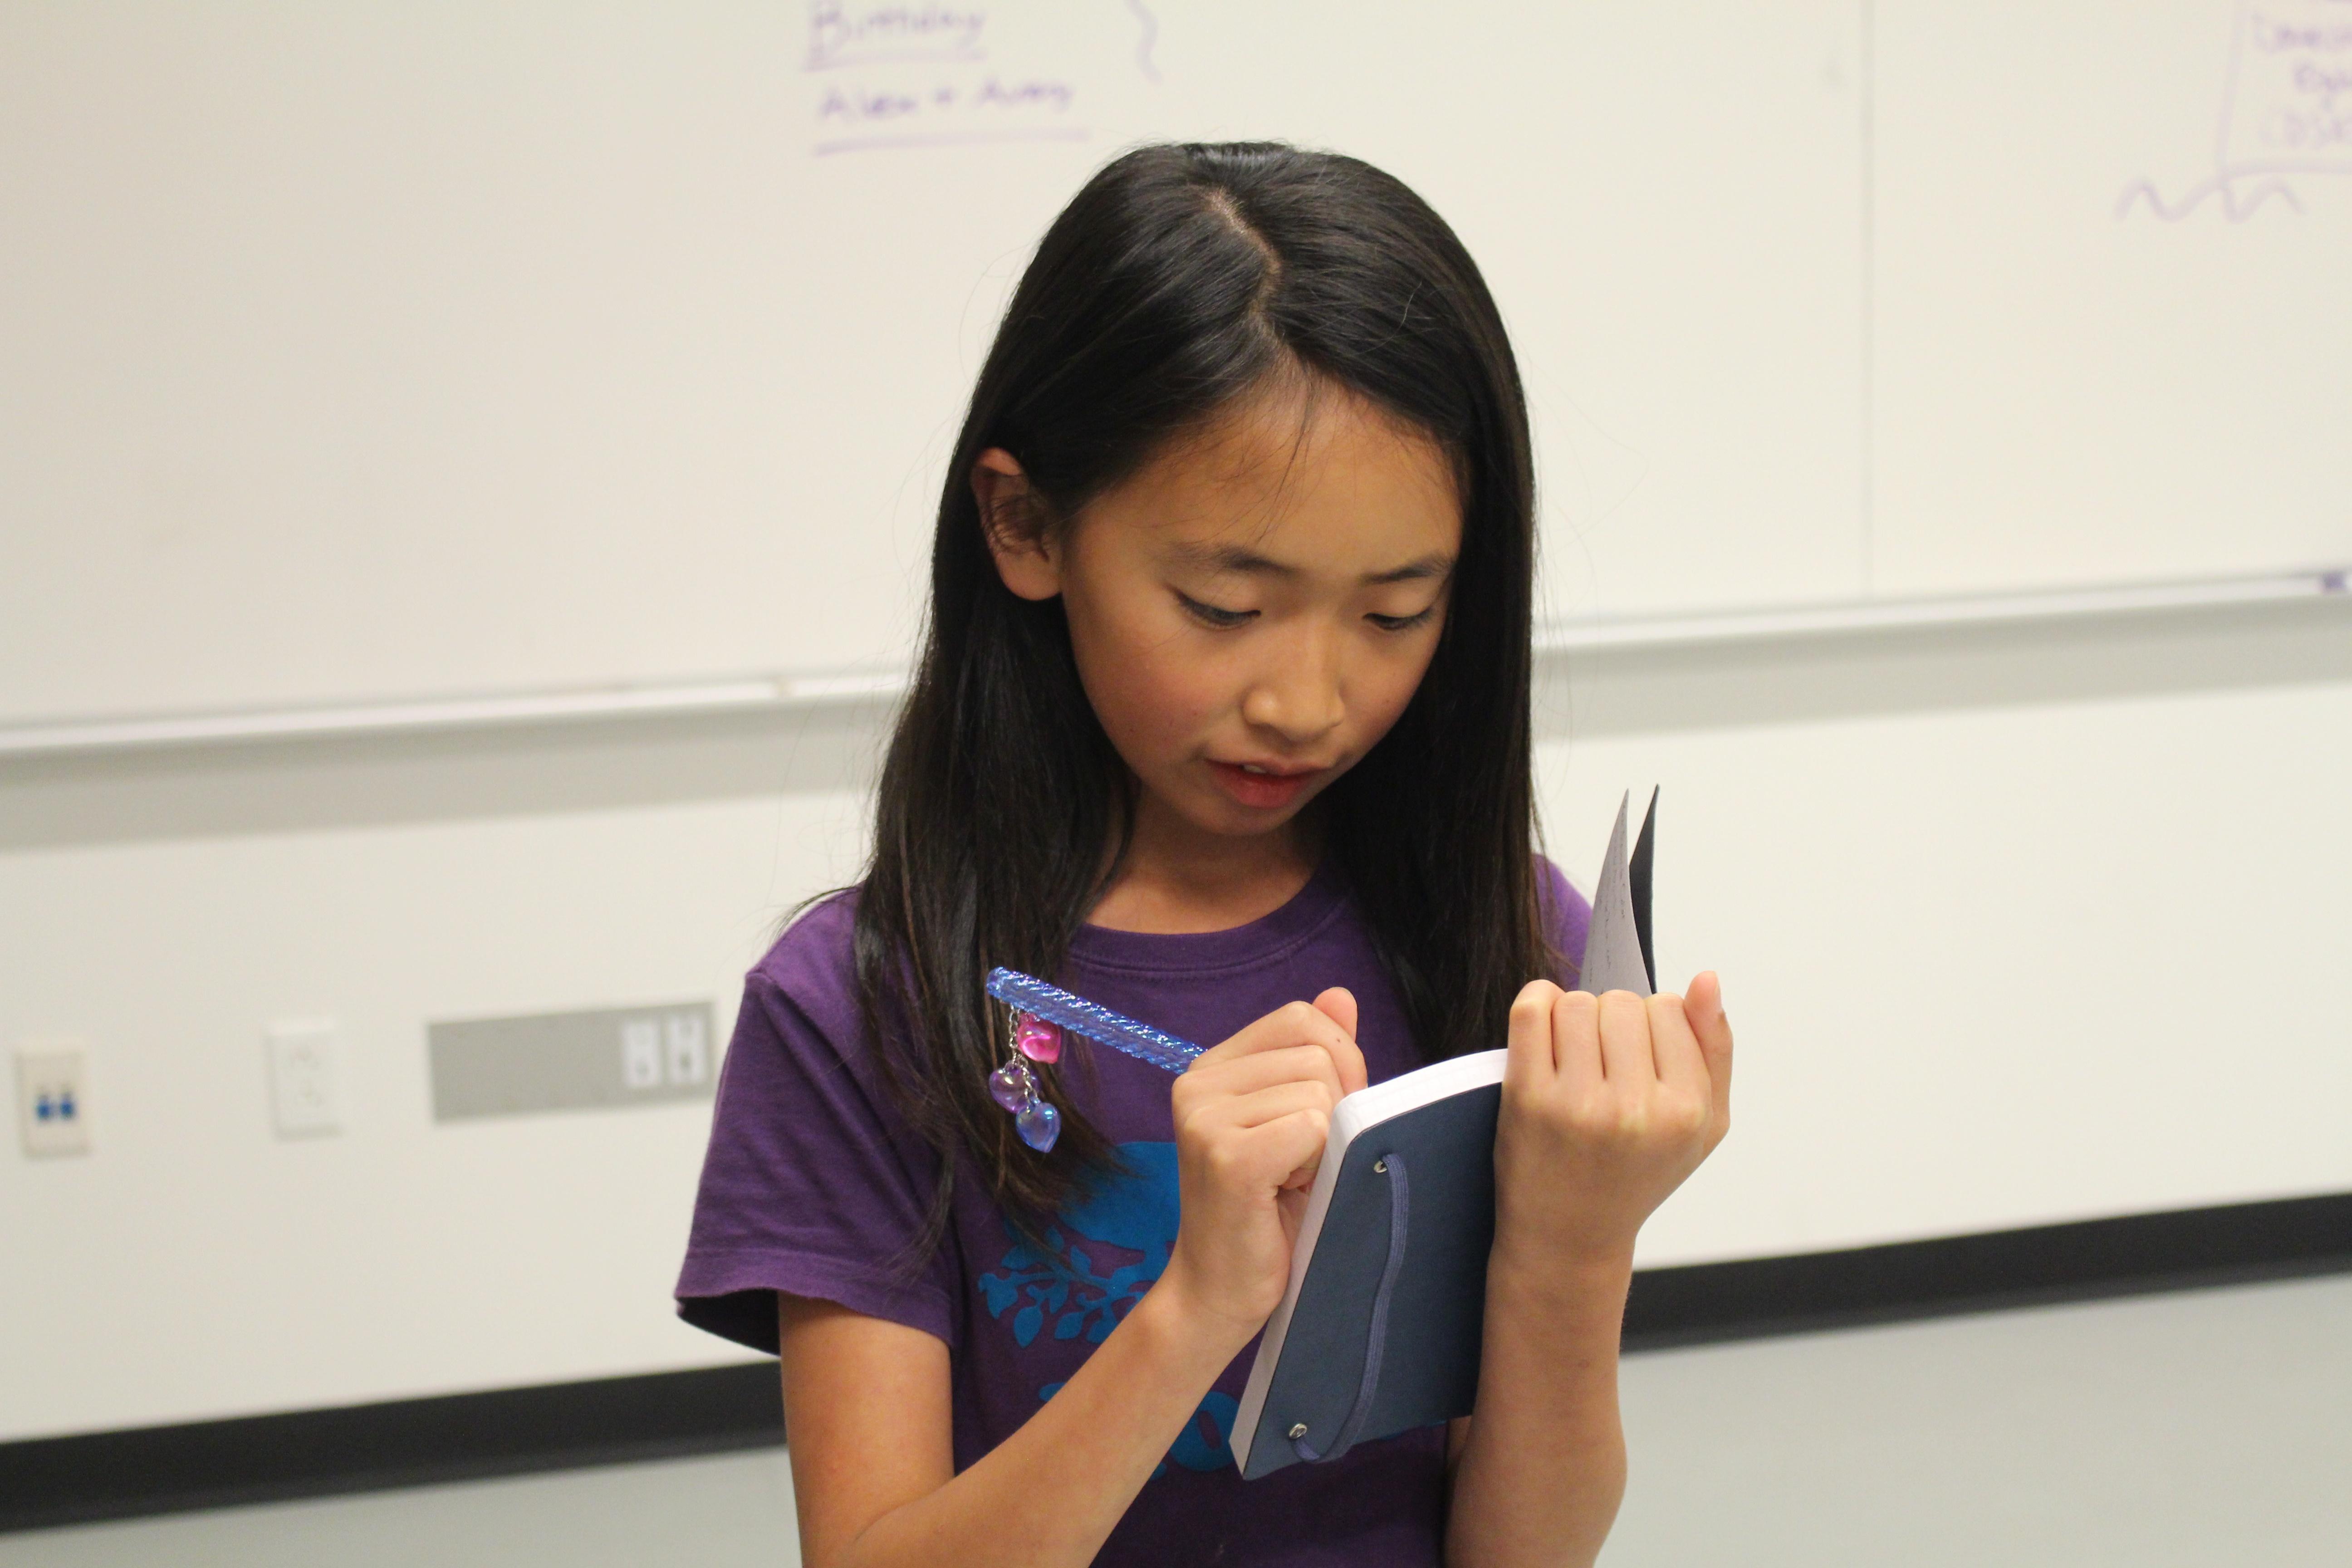 Jennifer takes notes preparing to speak in Communications class